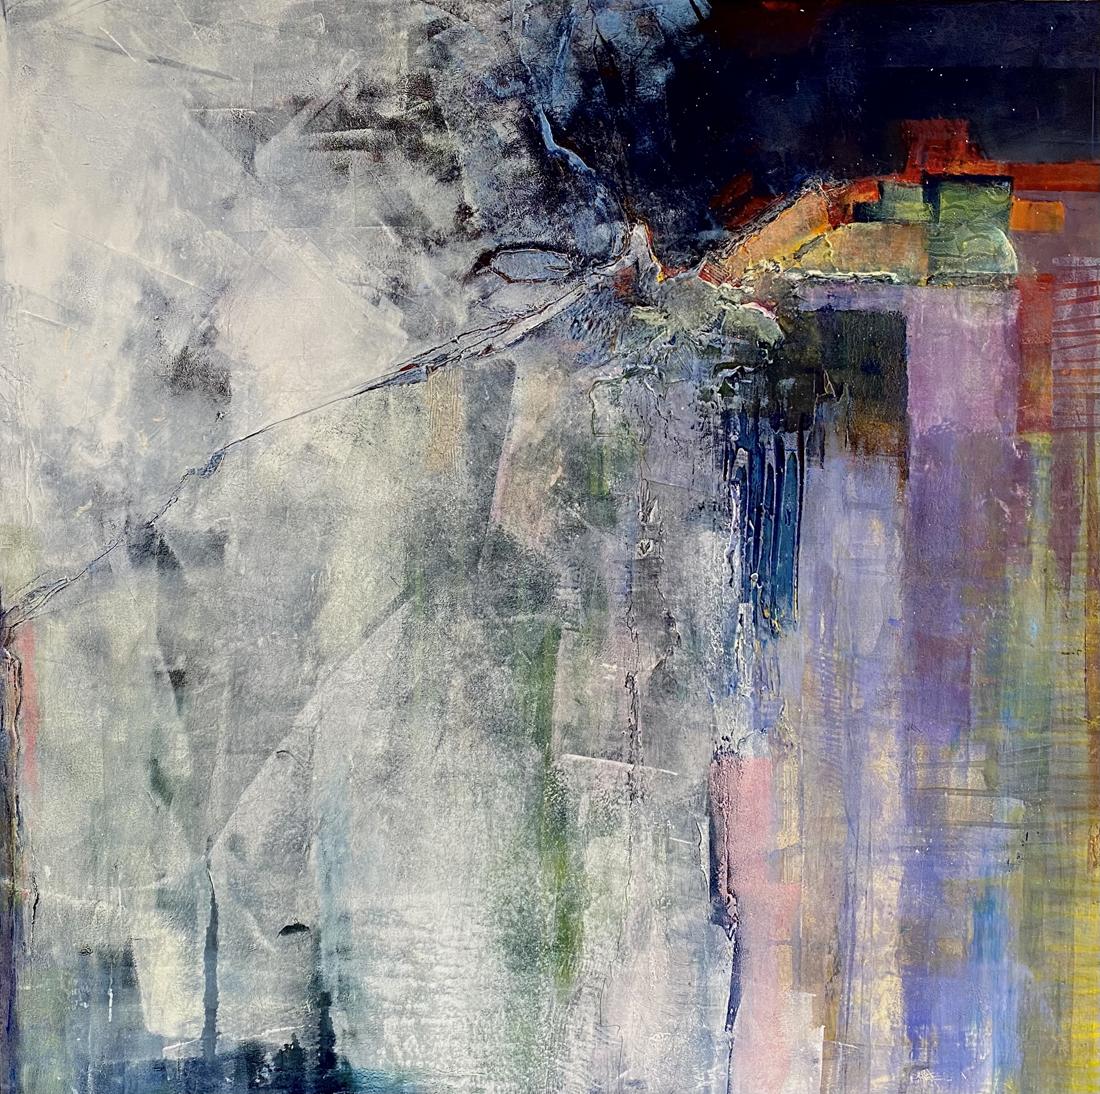 Kay-Zetlmaier-Echos-oil/cw